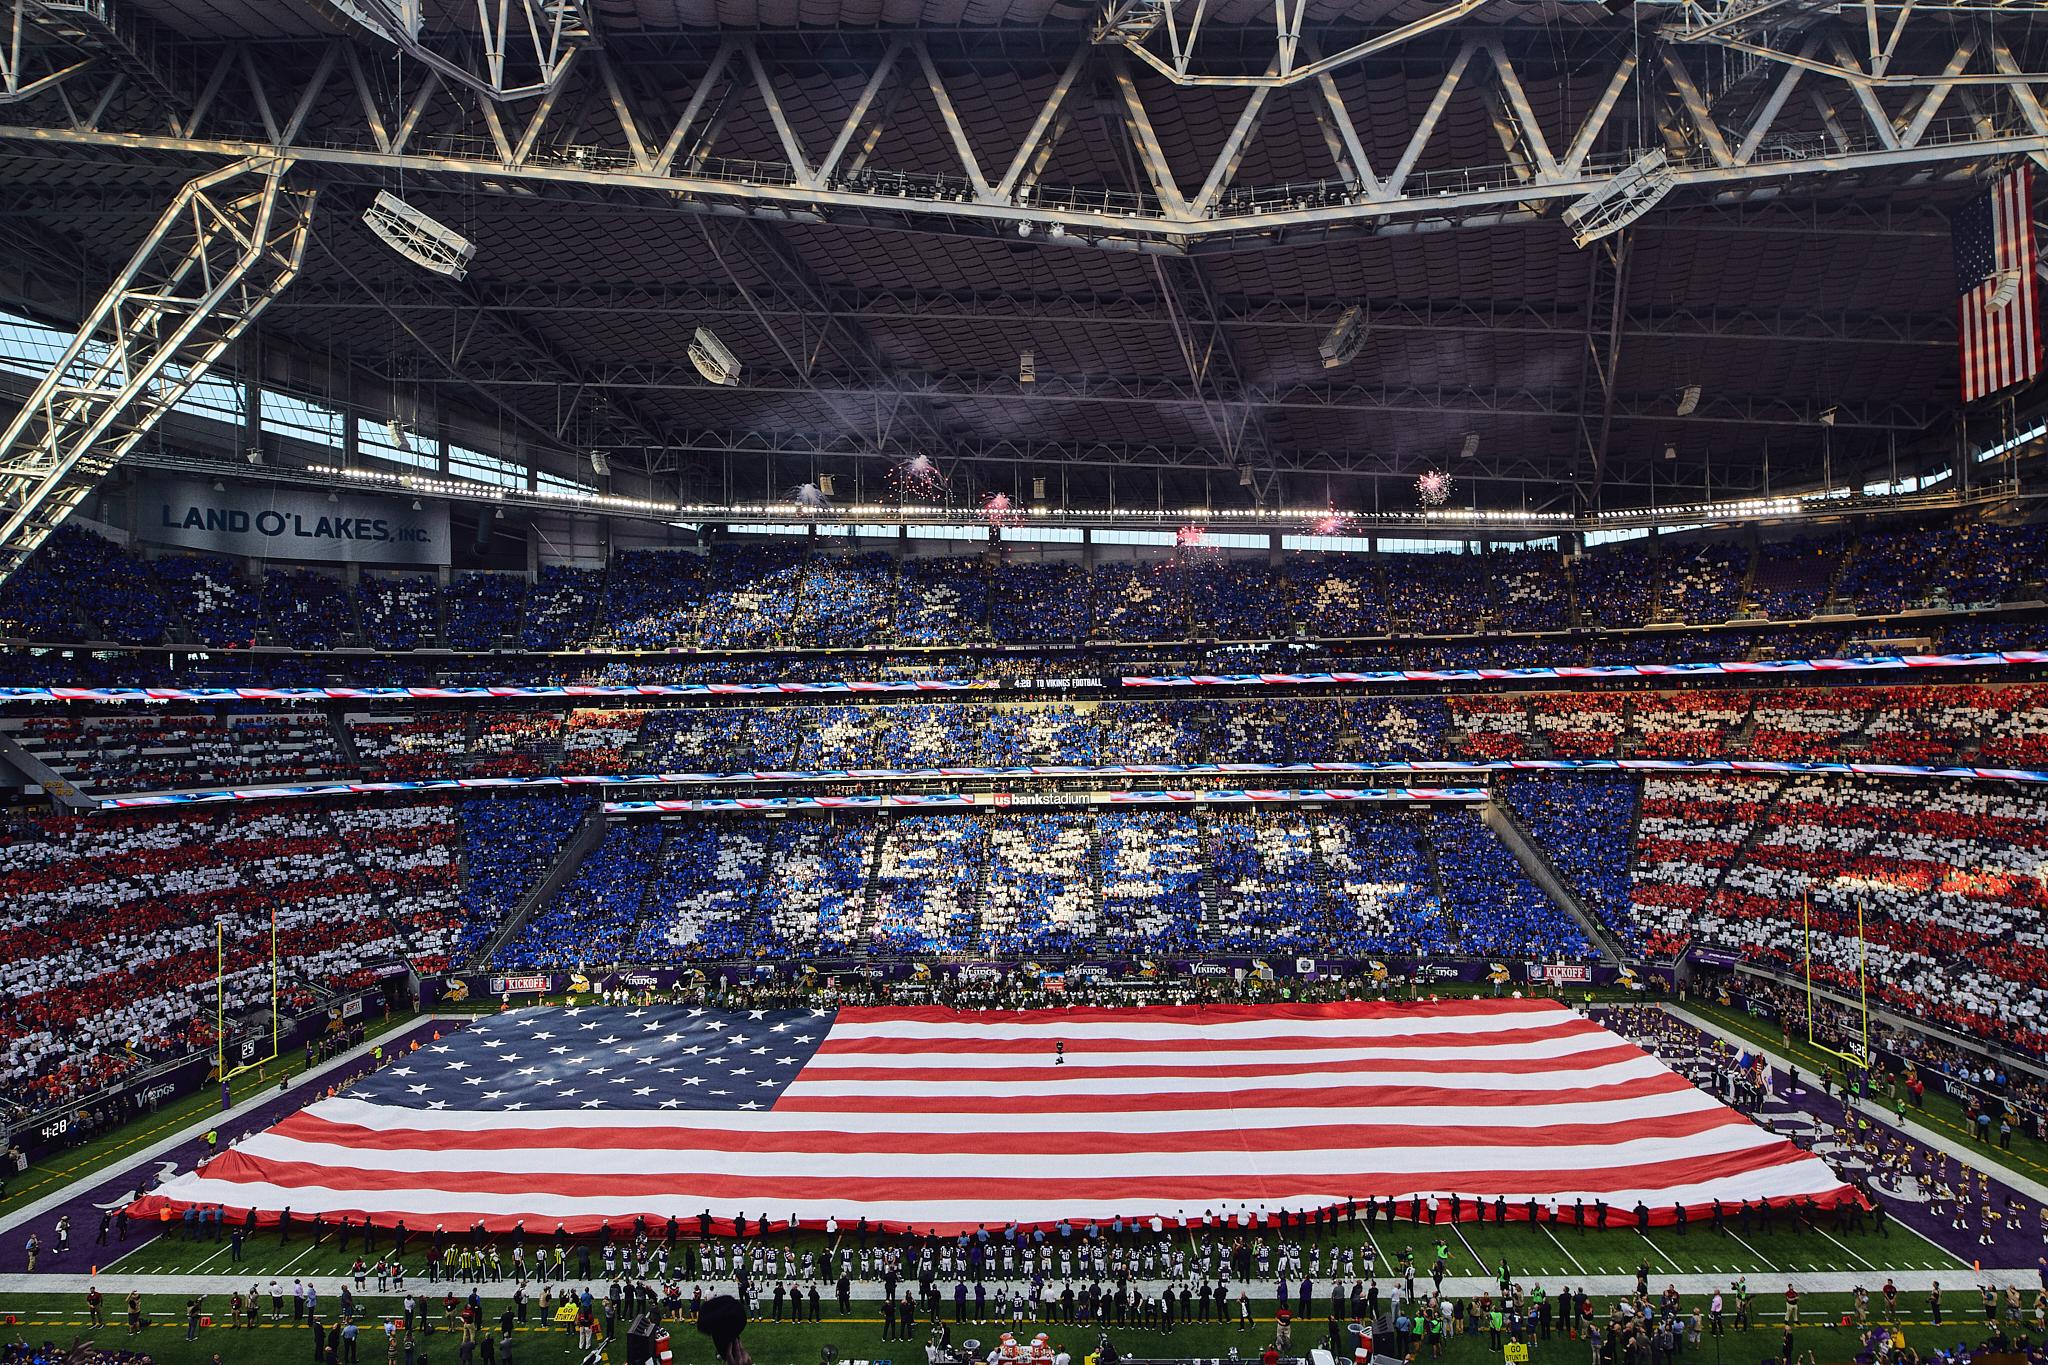 Minnesota_Vikings_9-11_Never_Forget_Flag_US_Bank_Stadium_Minneapolis_Minnesota_Photography_By_Joe_Lemke_045.JPG